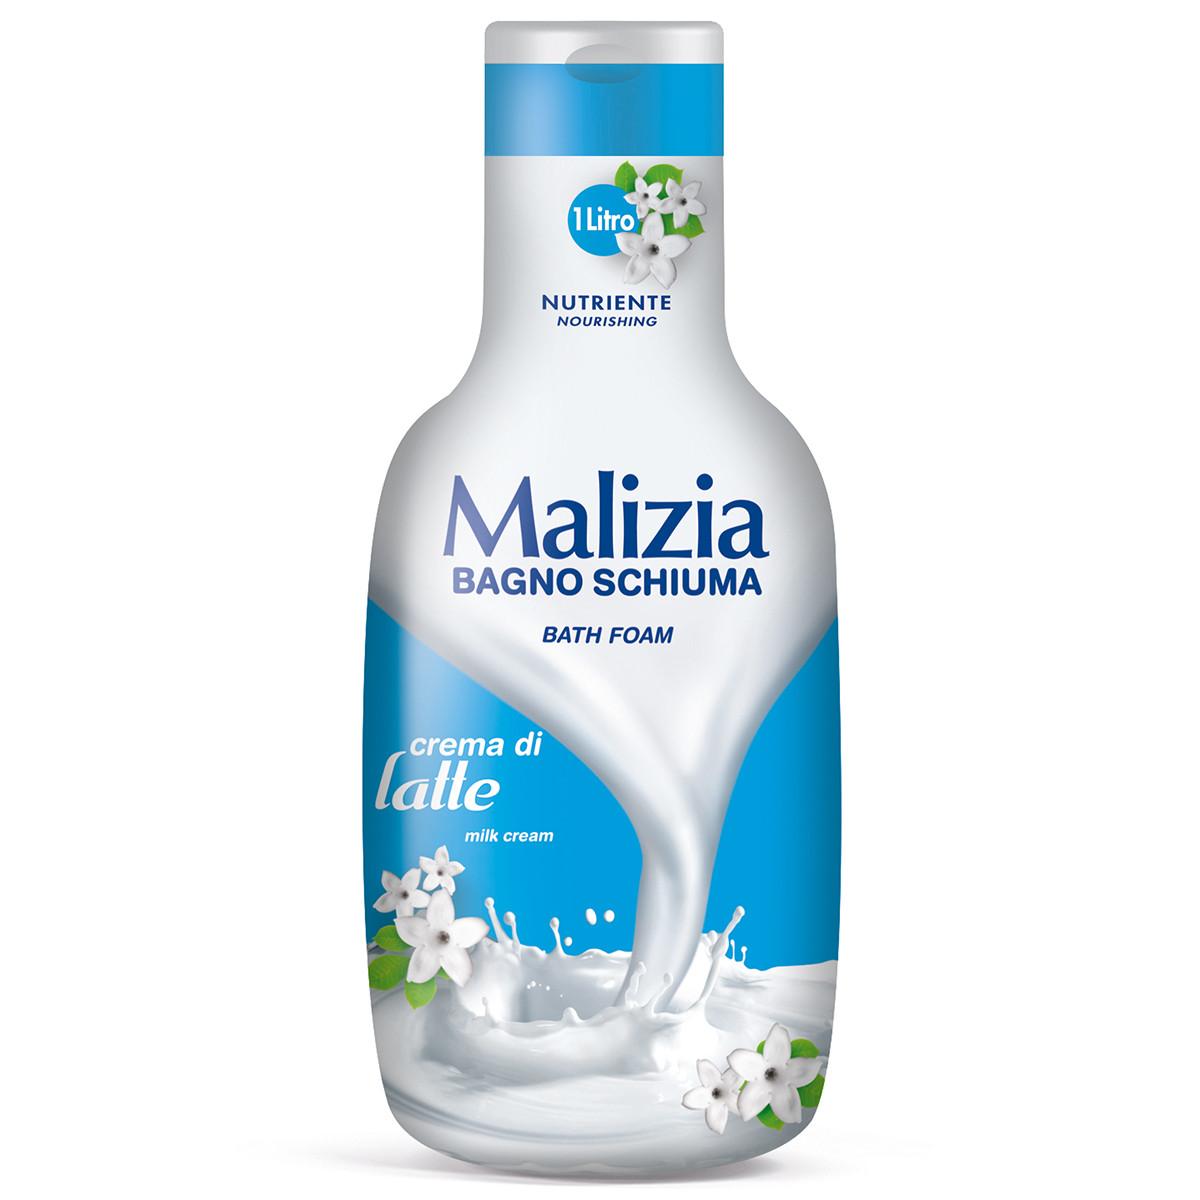 Malizia 玛莉吉亚沐浴露(牛奶)1000ml 清洁 新老包装随机发货